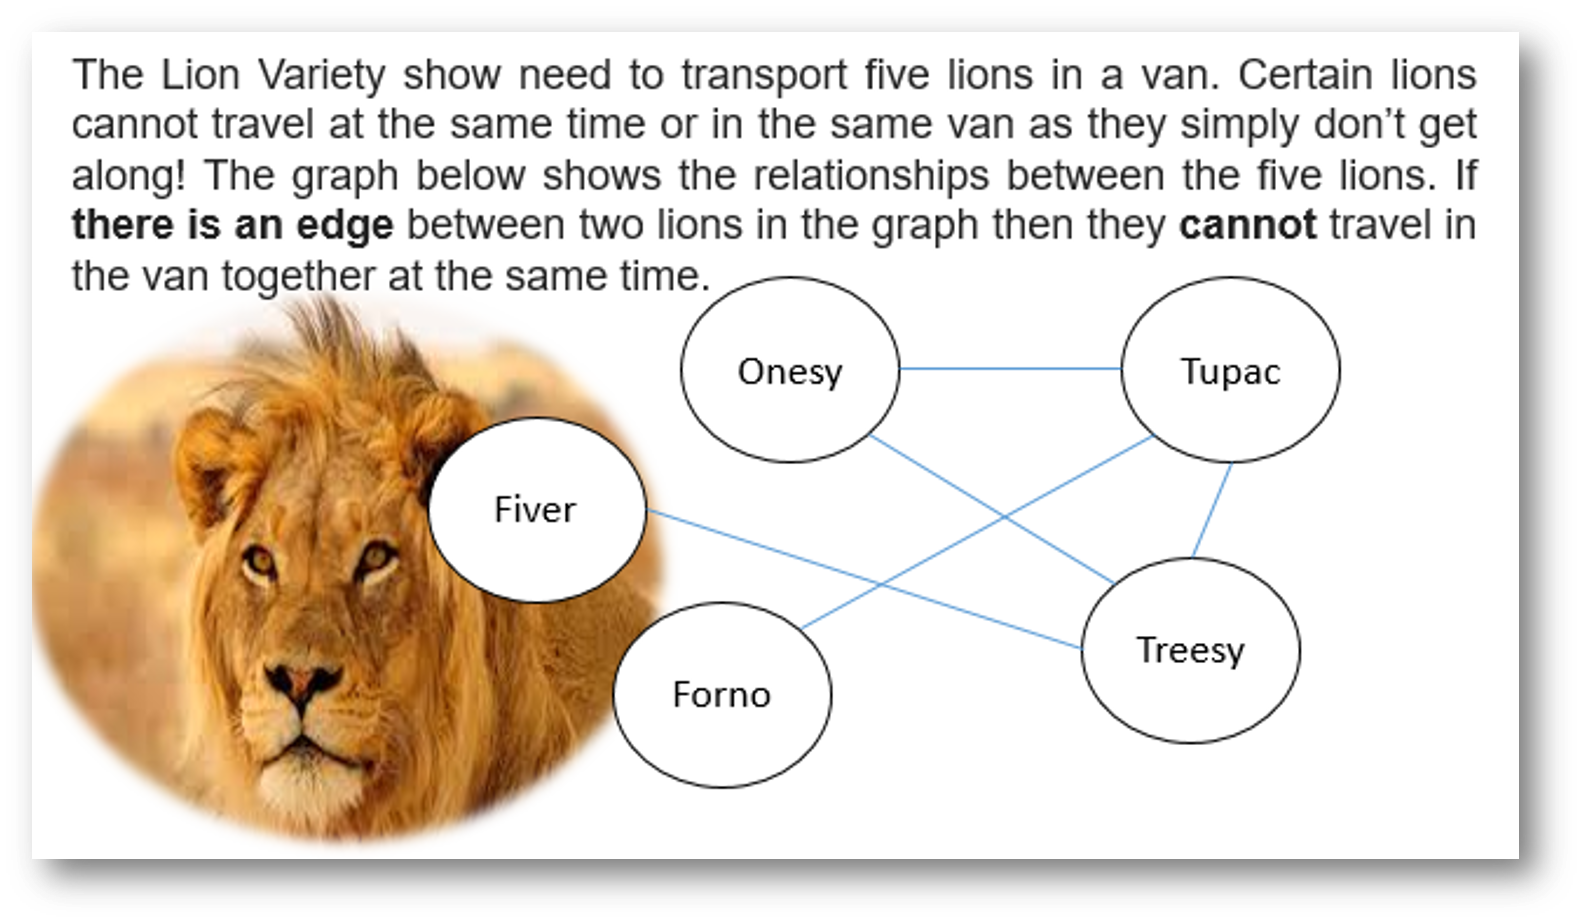 alevelcomp_paper1_cert_lionvariety_image1.png